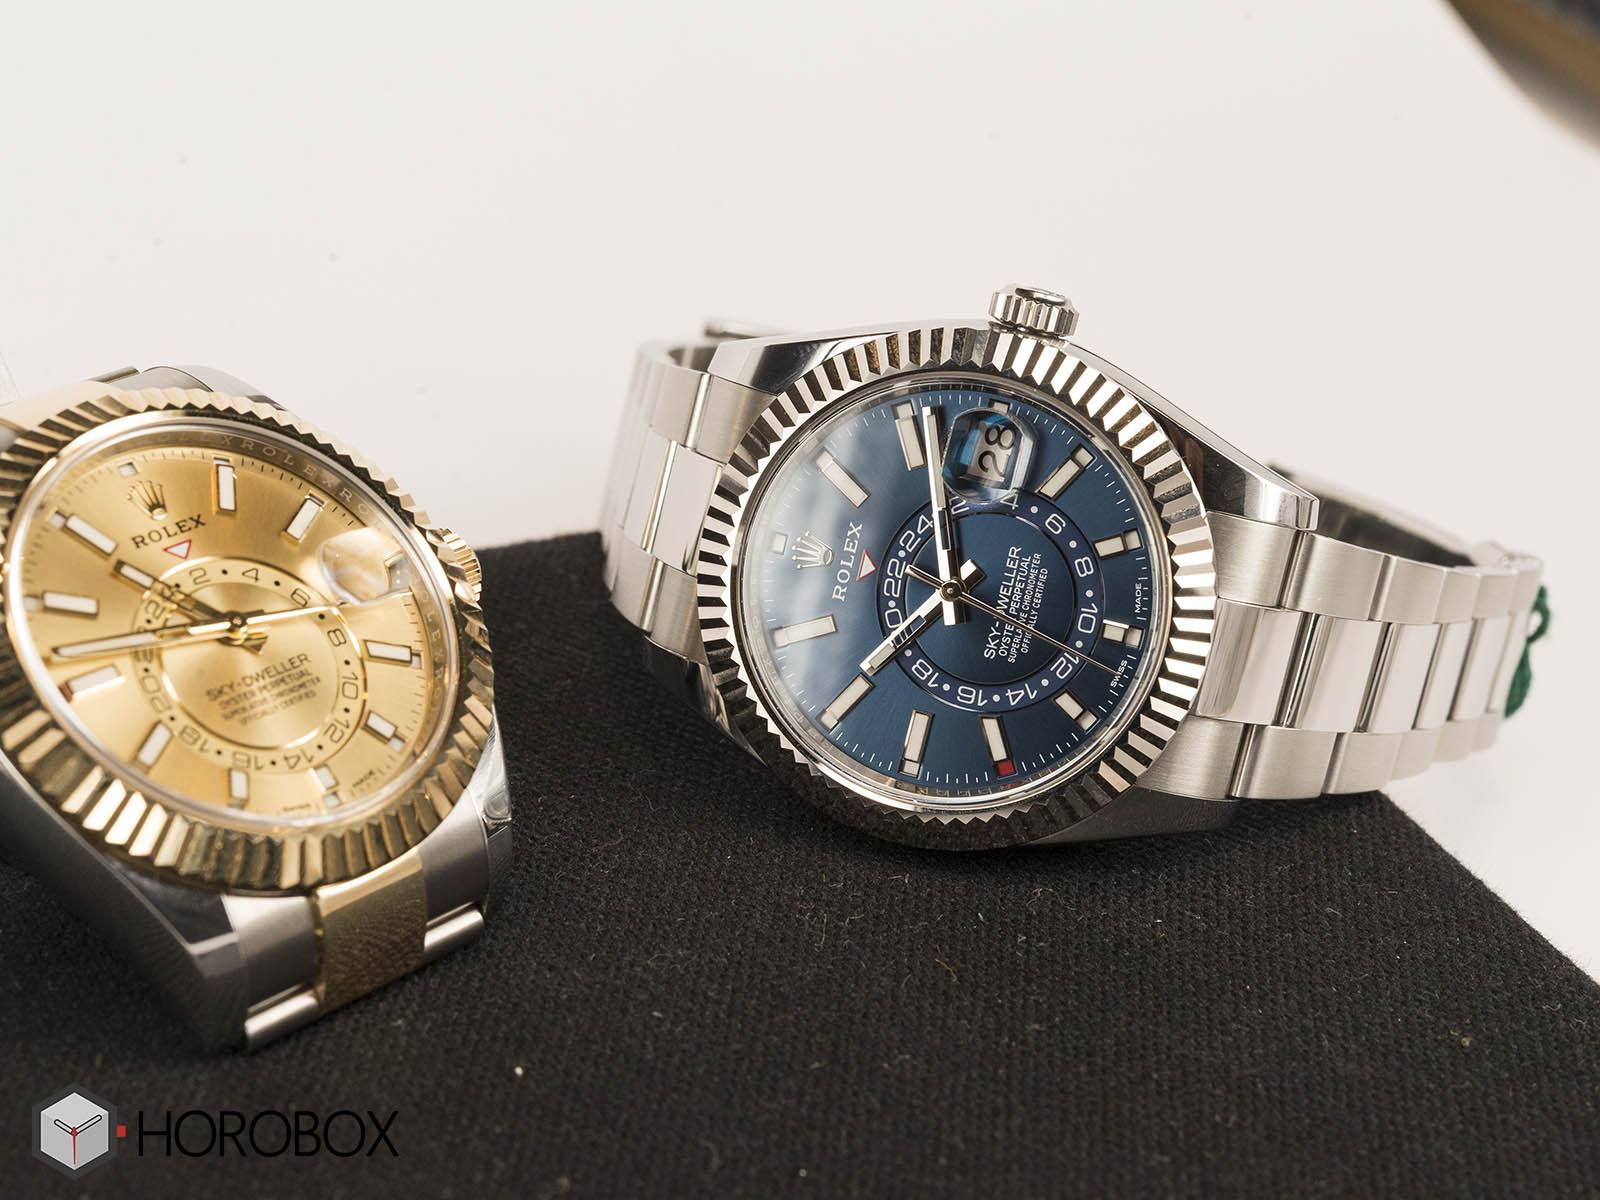 Rolex-Oyster-Perpetual-Sky-Dweller-1.jpg